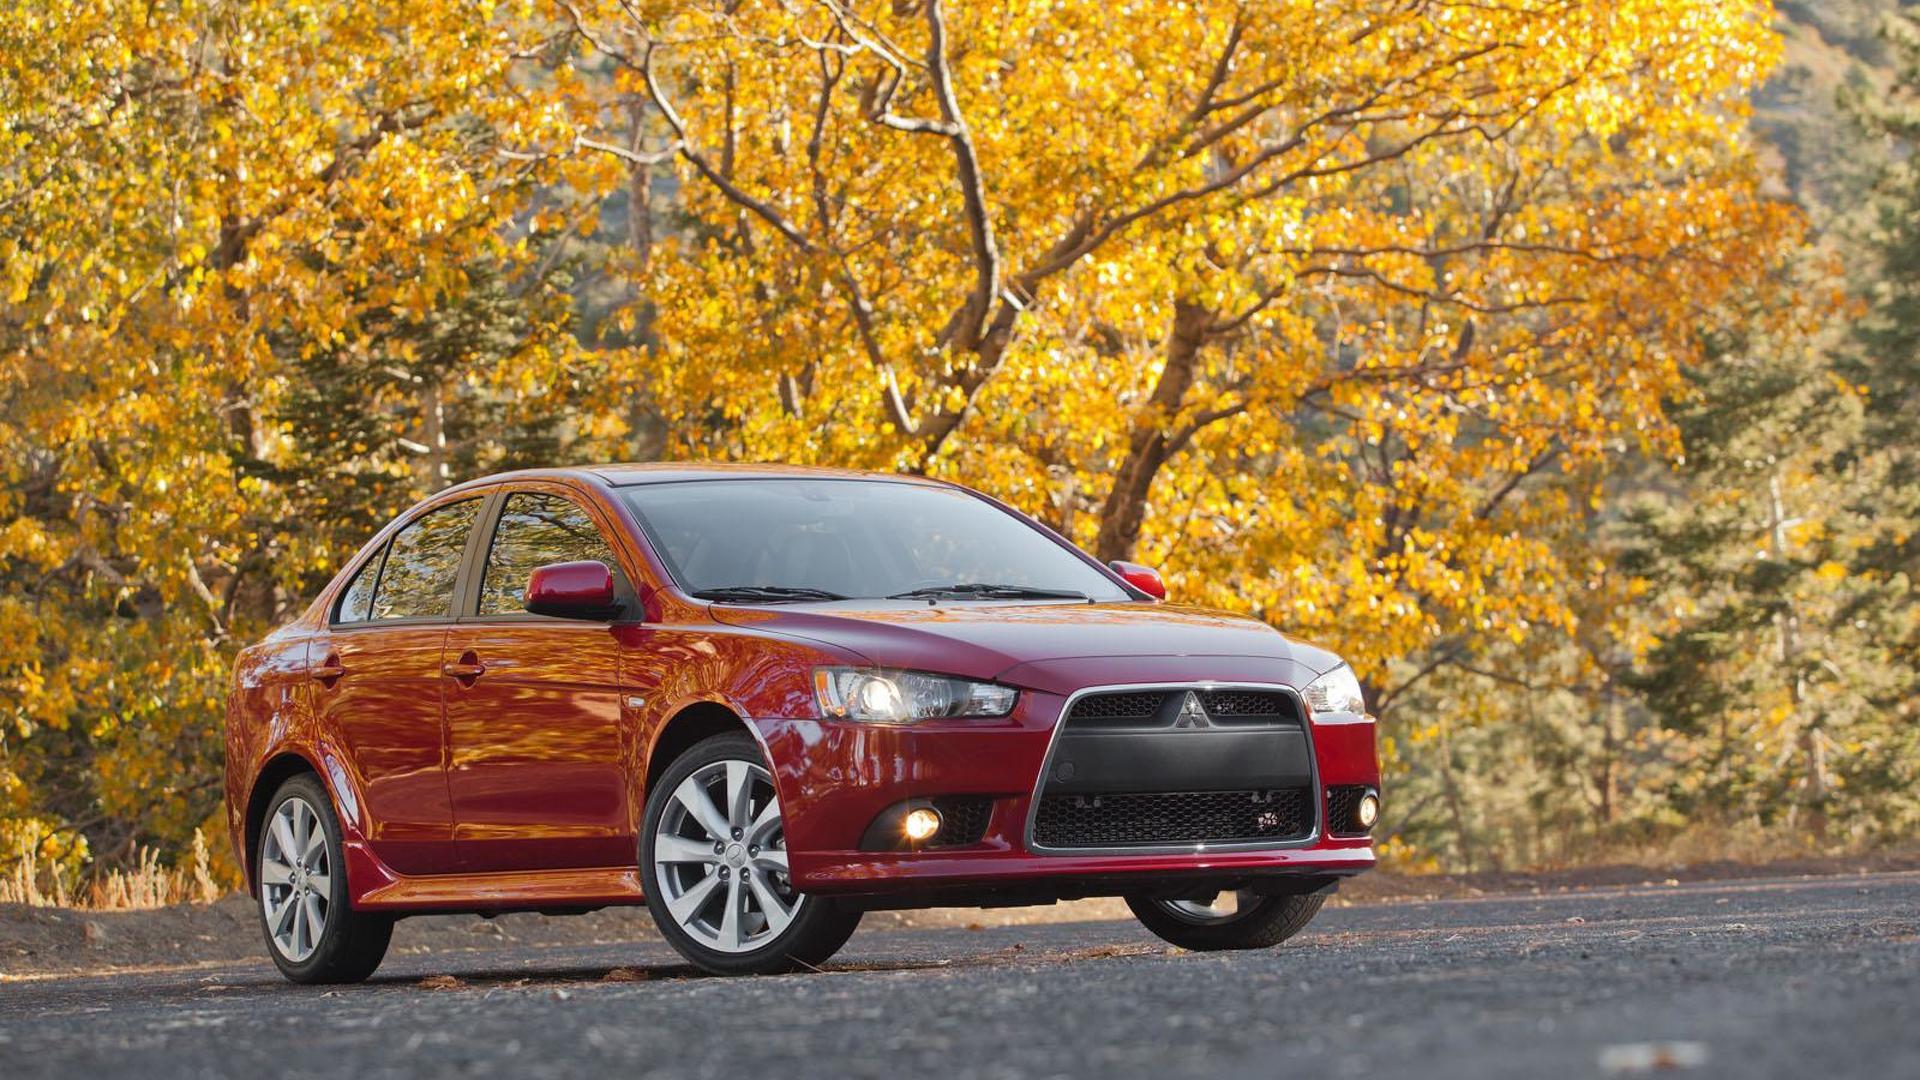 Mitsubishi Lancer facelift coming later this year